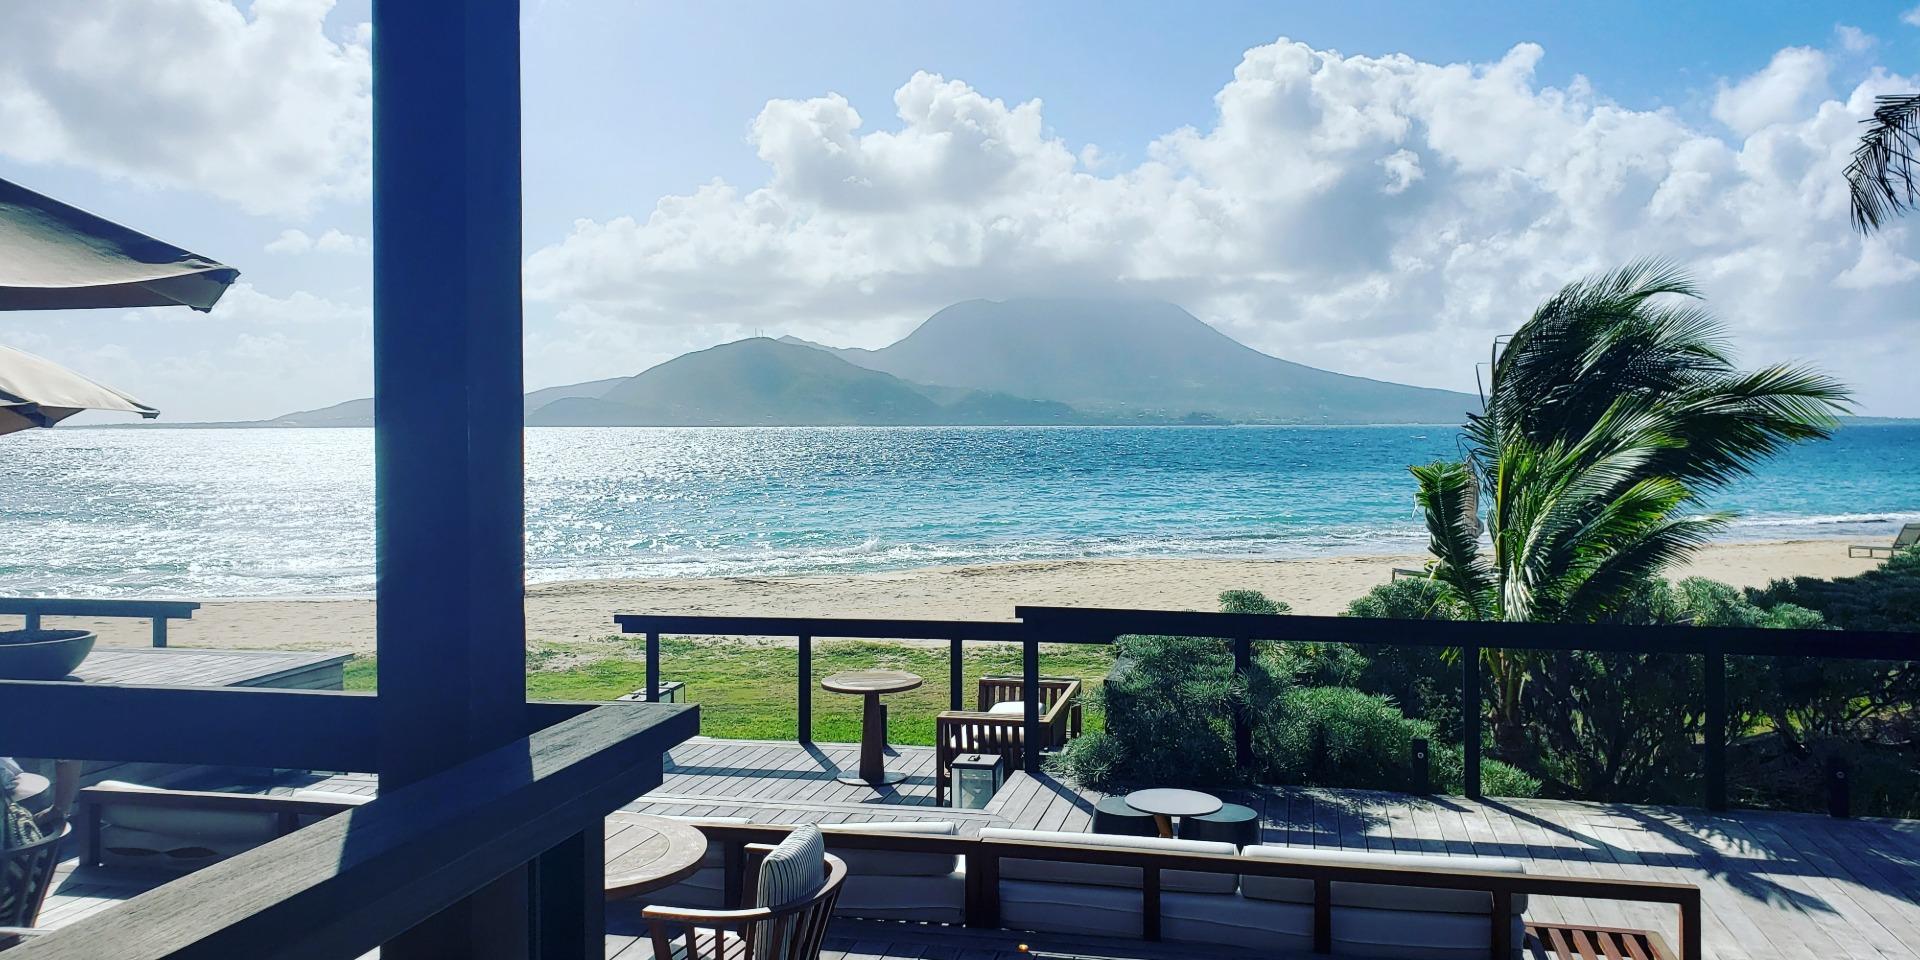 St Kitts Nevis Zoom Background